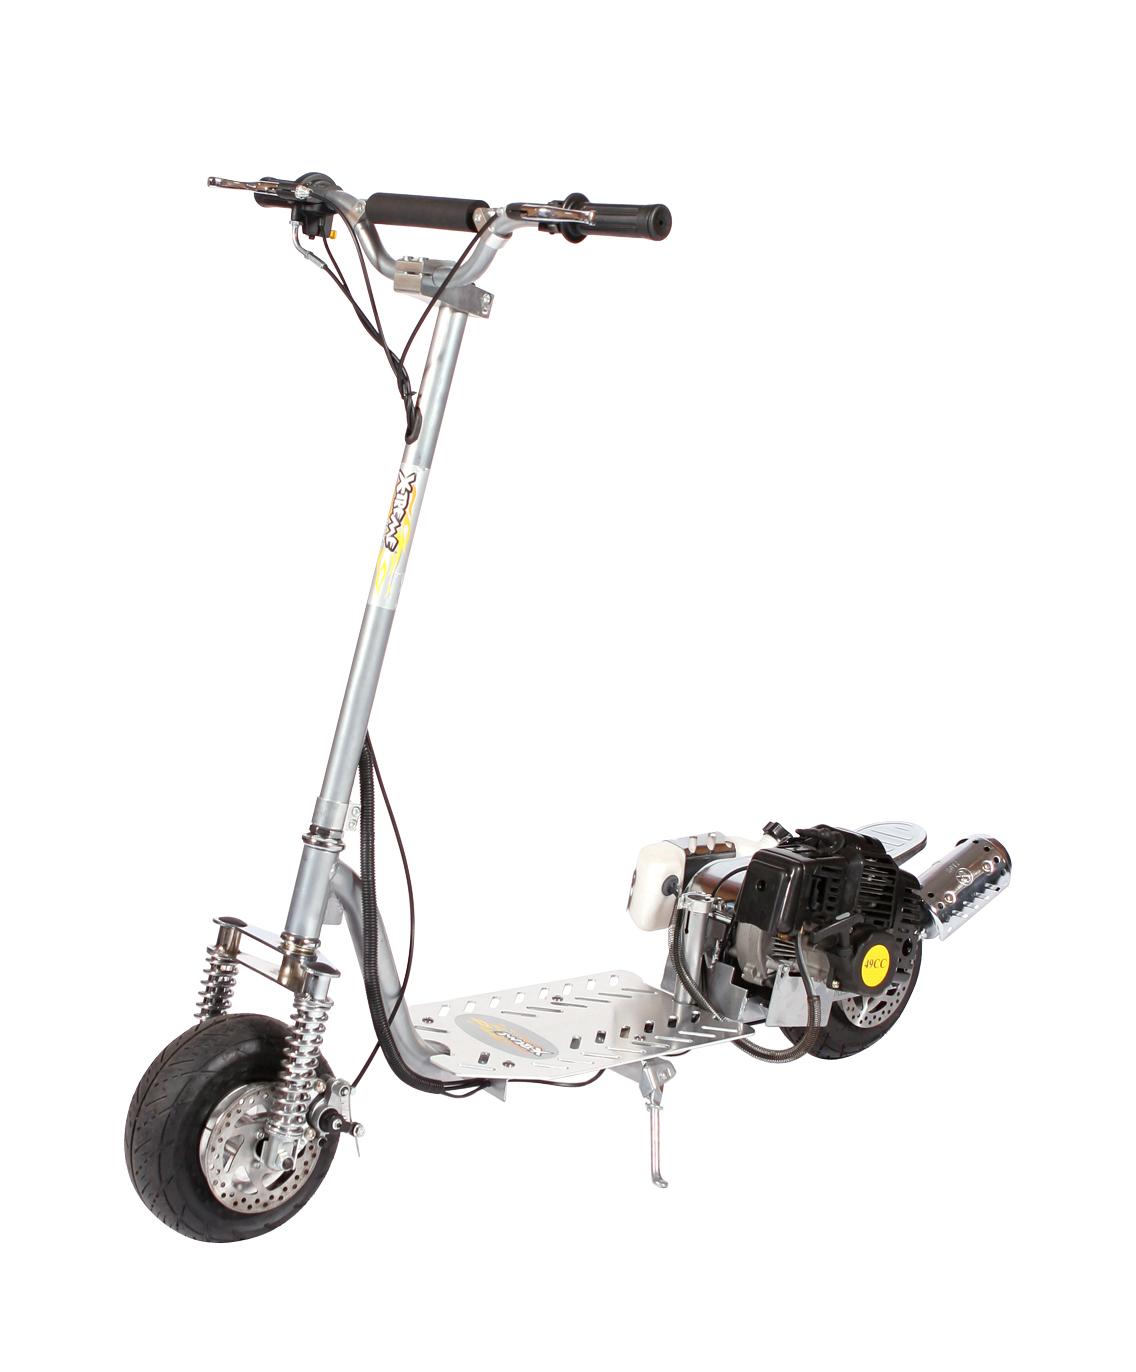 X-Treme XG-499 Scooter Parts